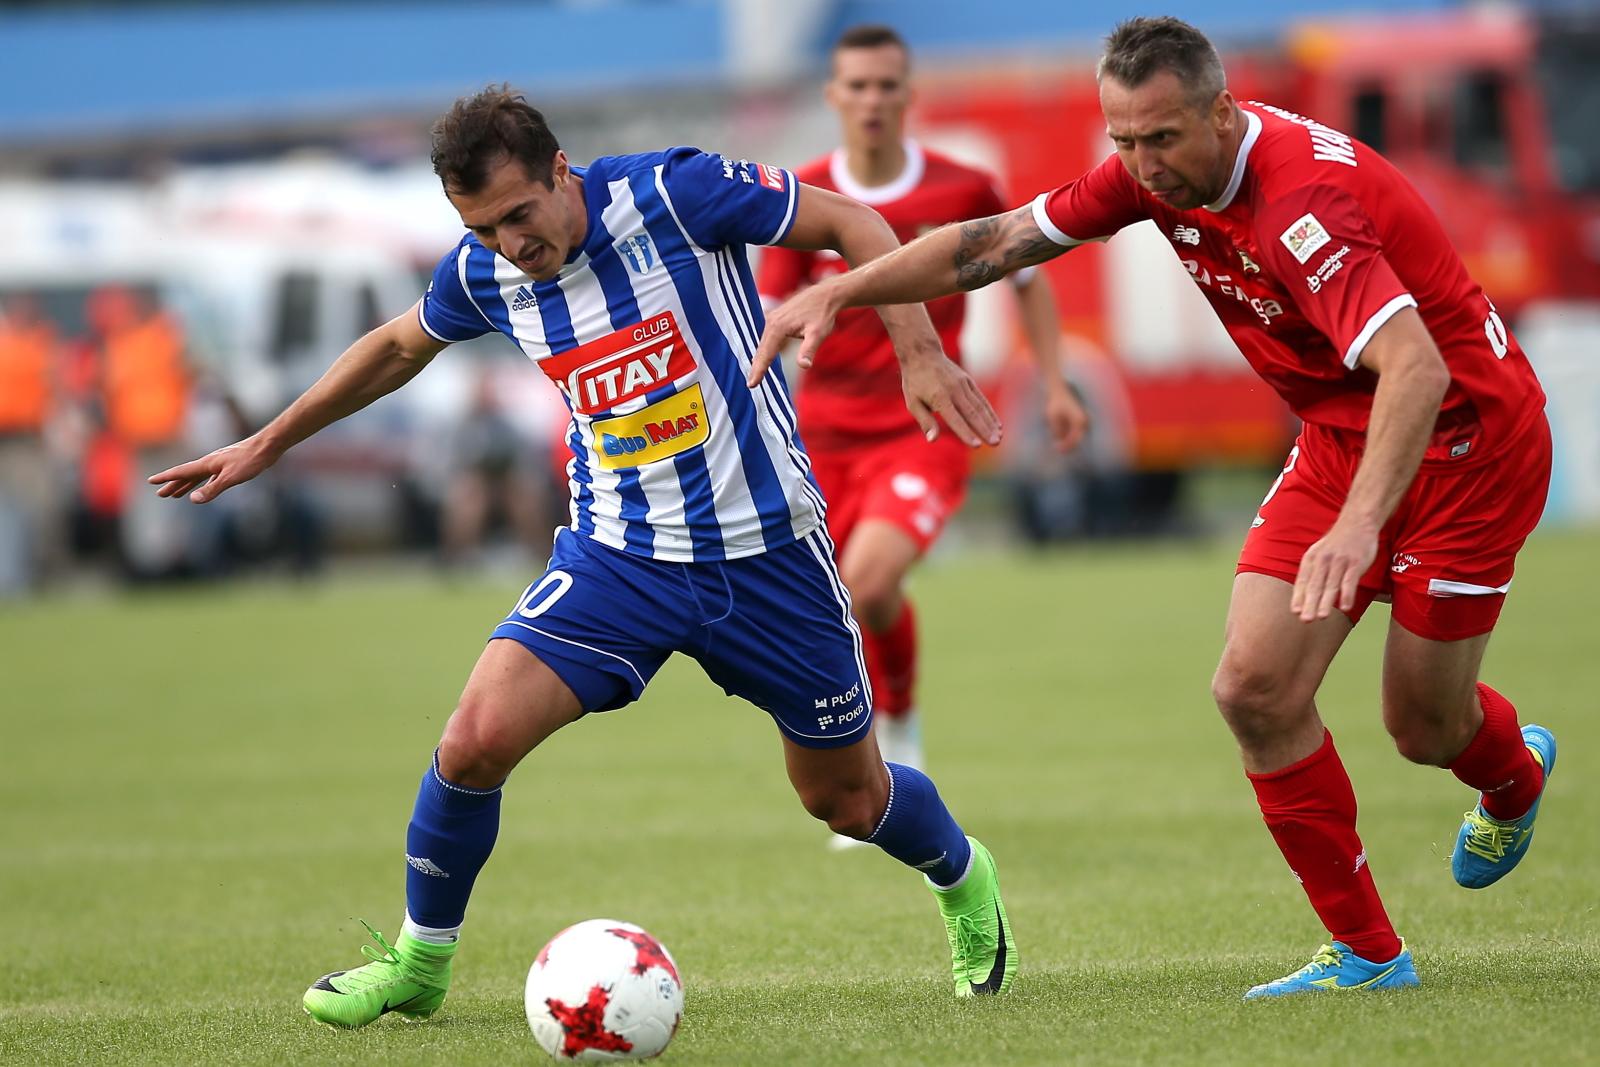 Inauguracja nowego sezonu Ekstraklasy. fot. PAP/Marcin Bednarski